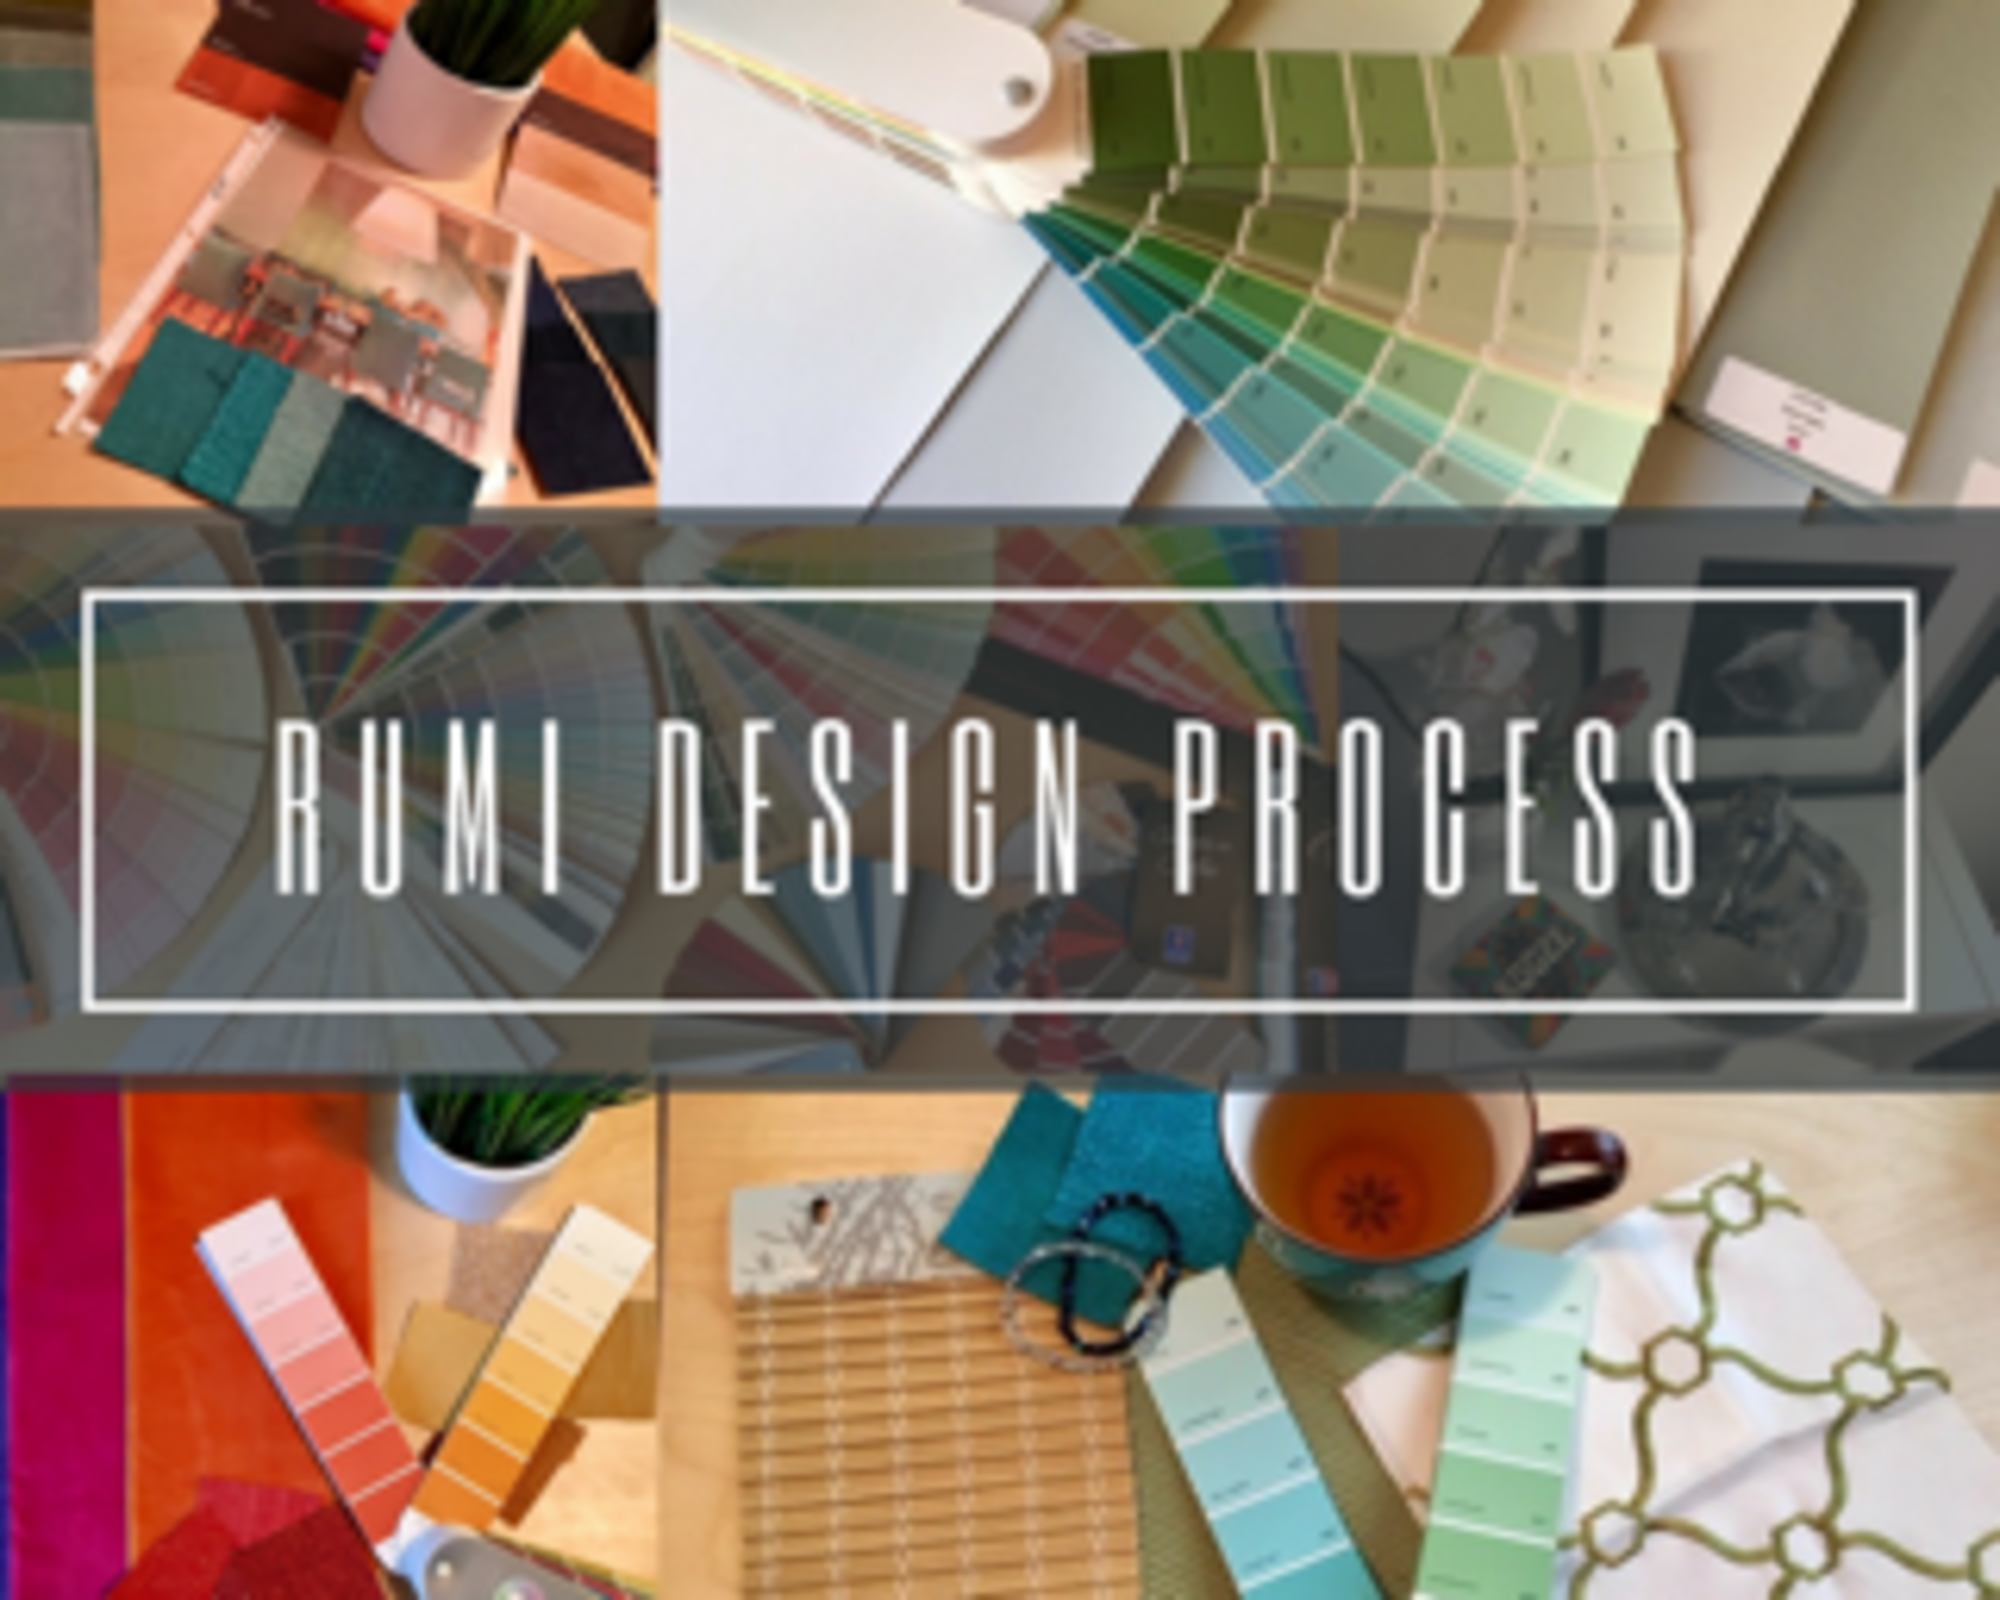 RUMI Design Proceess